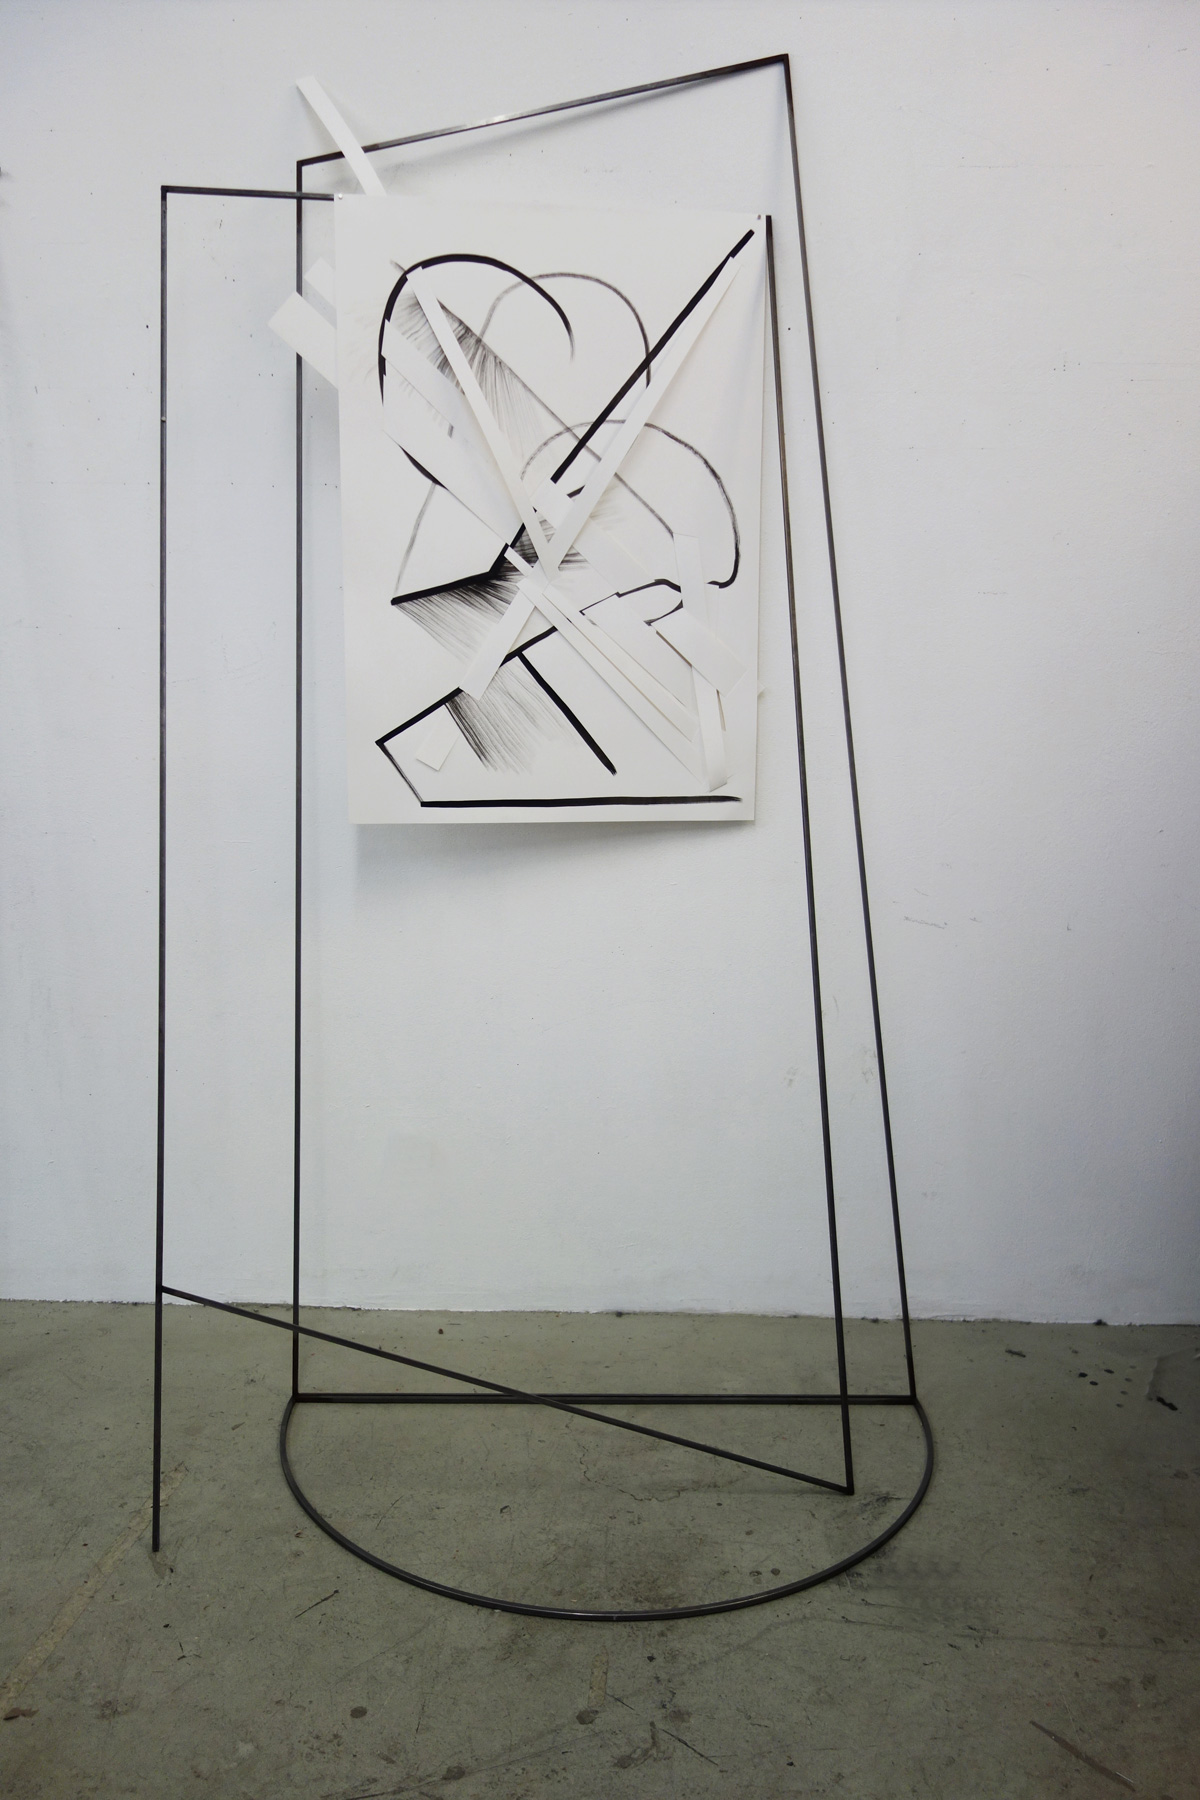 Nina Annabelle Märkl | Frames | Ink and steel drawing | 210 x 120 x 80 cm | 2018